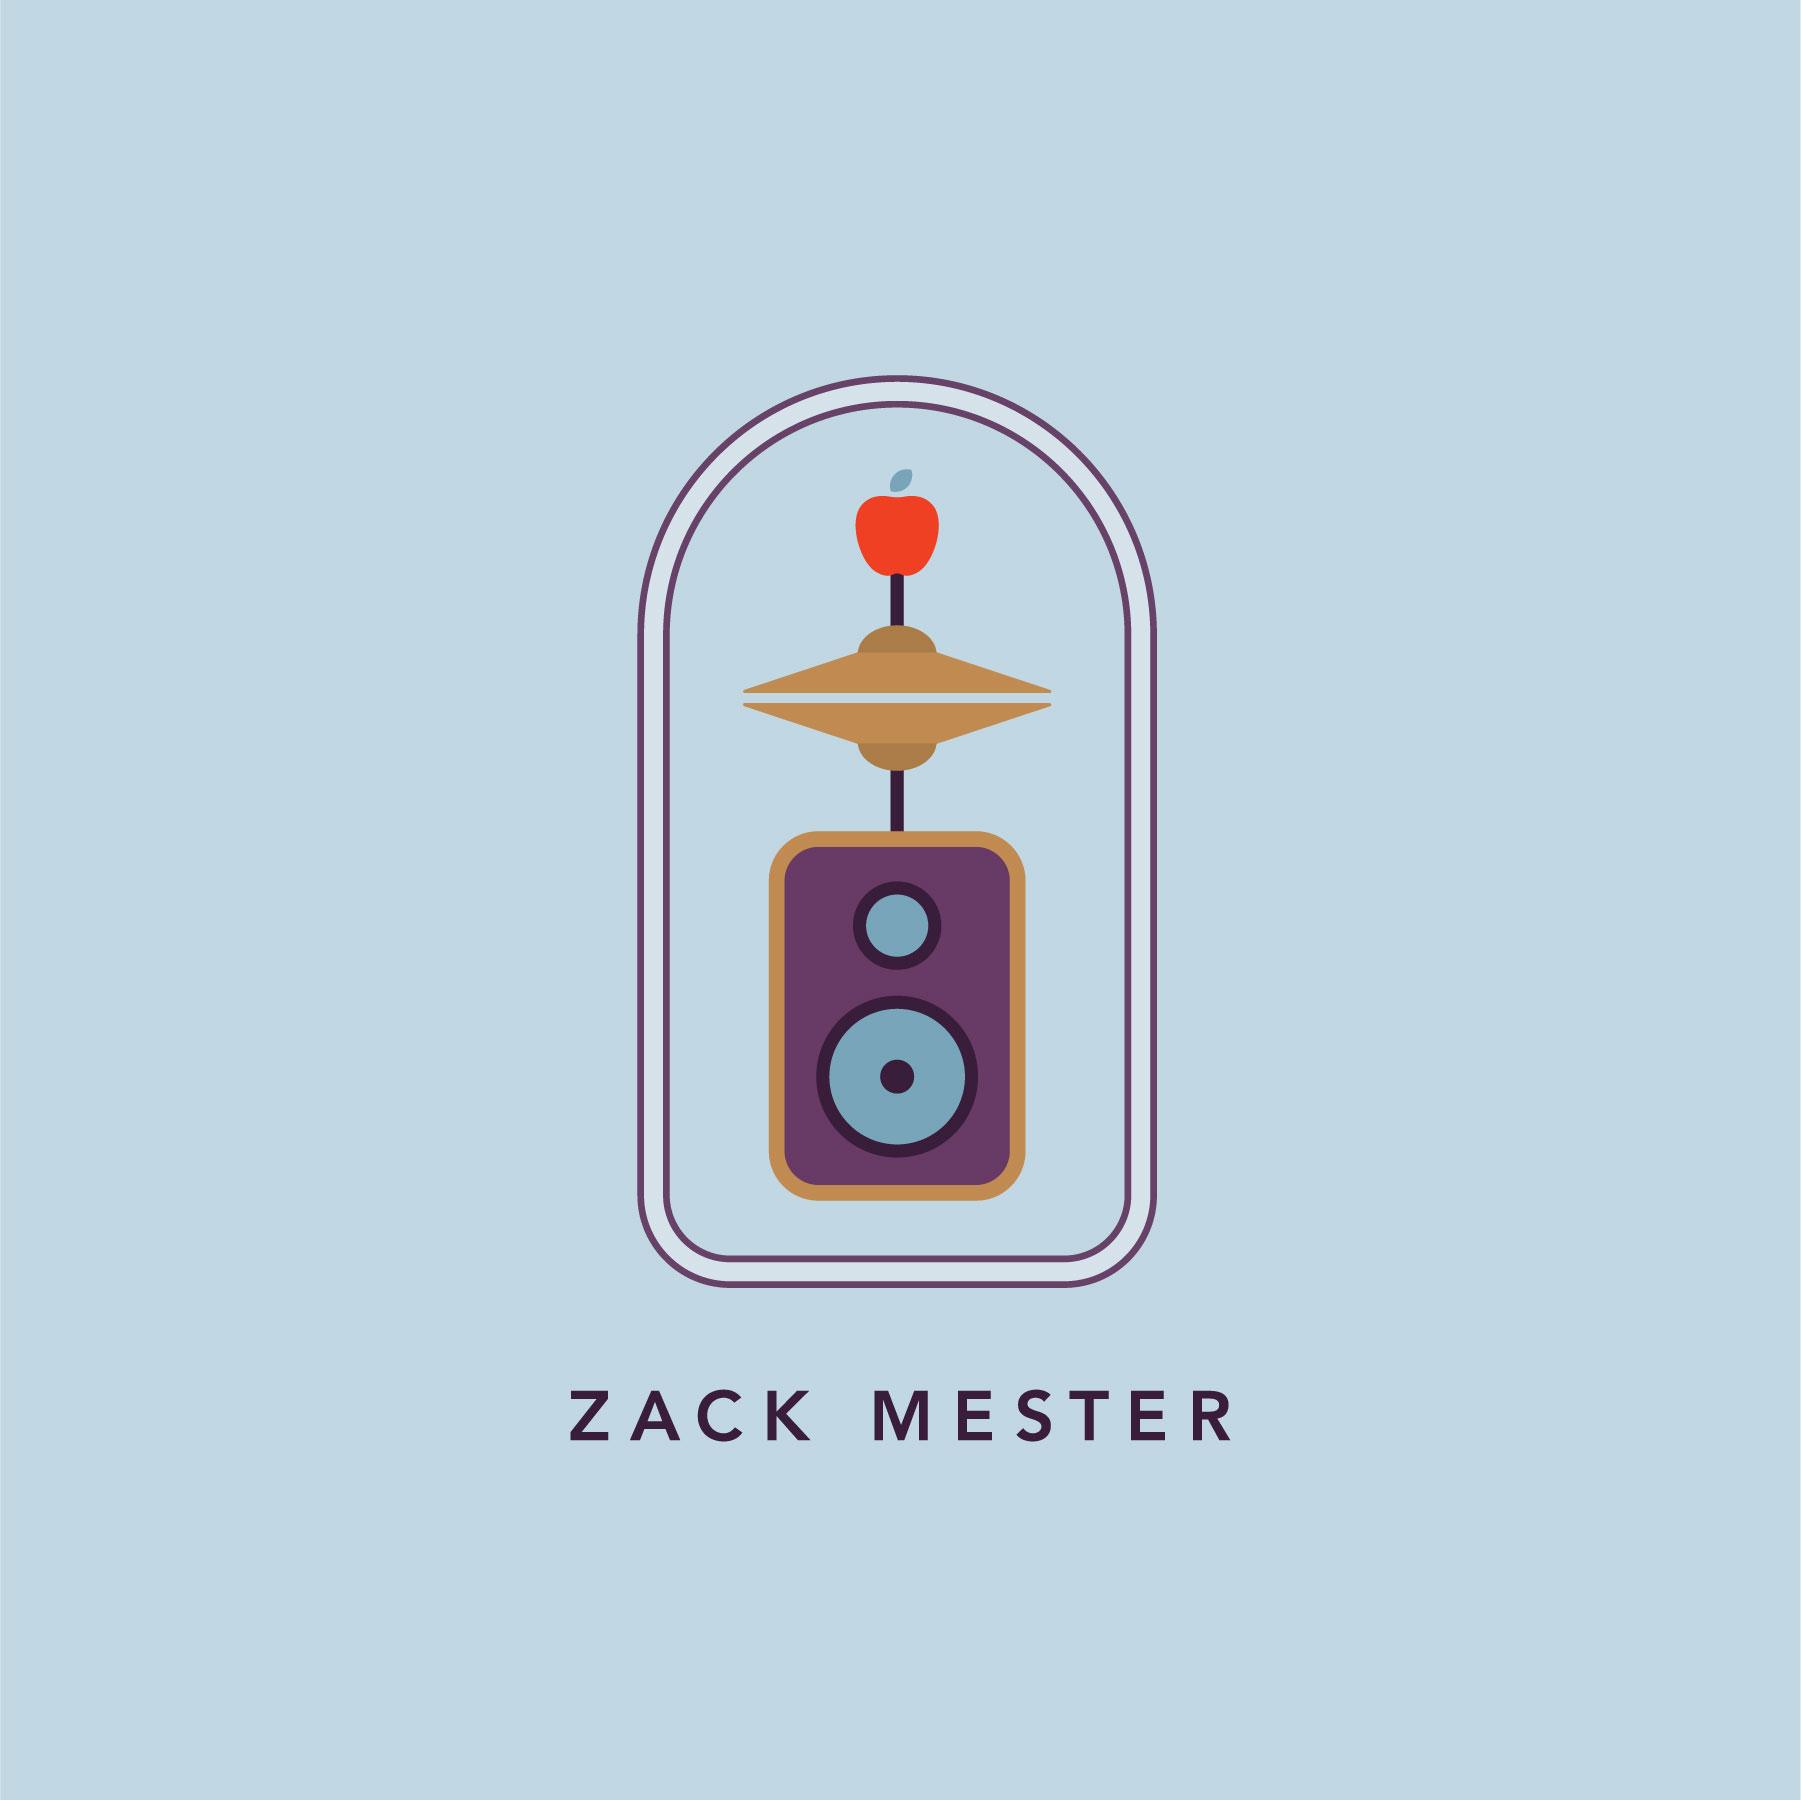 logo_zackMester.jpg